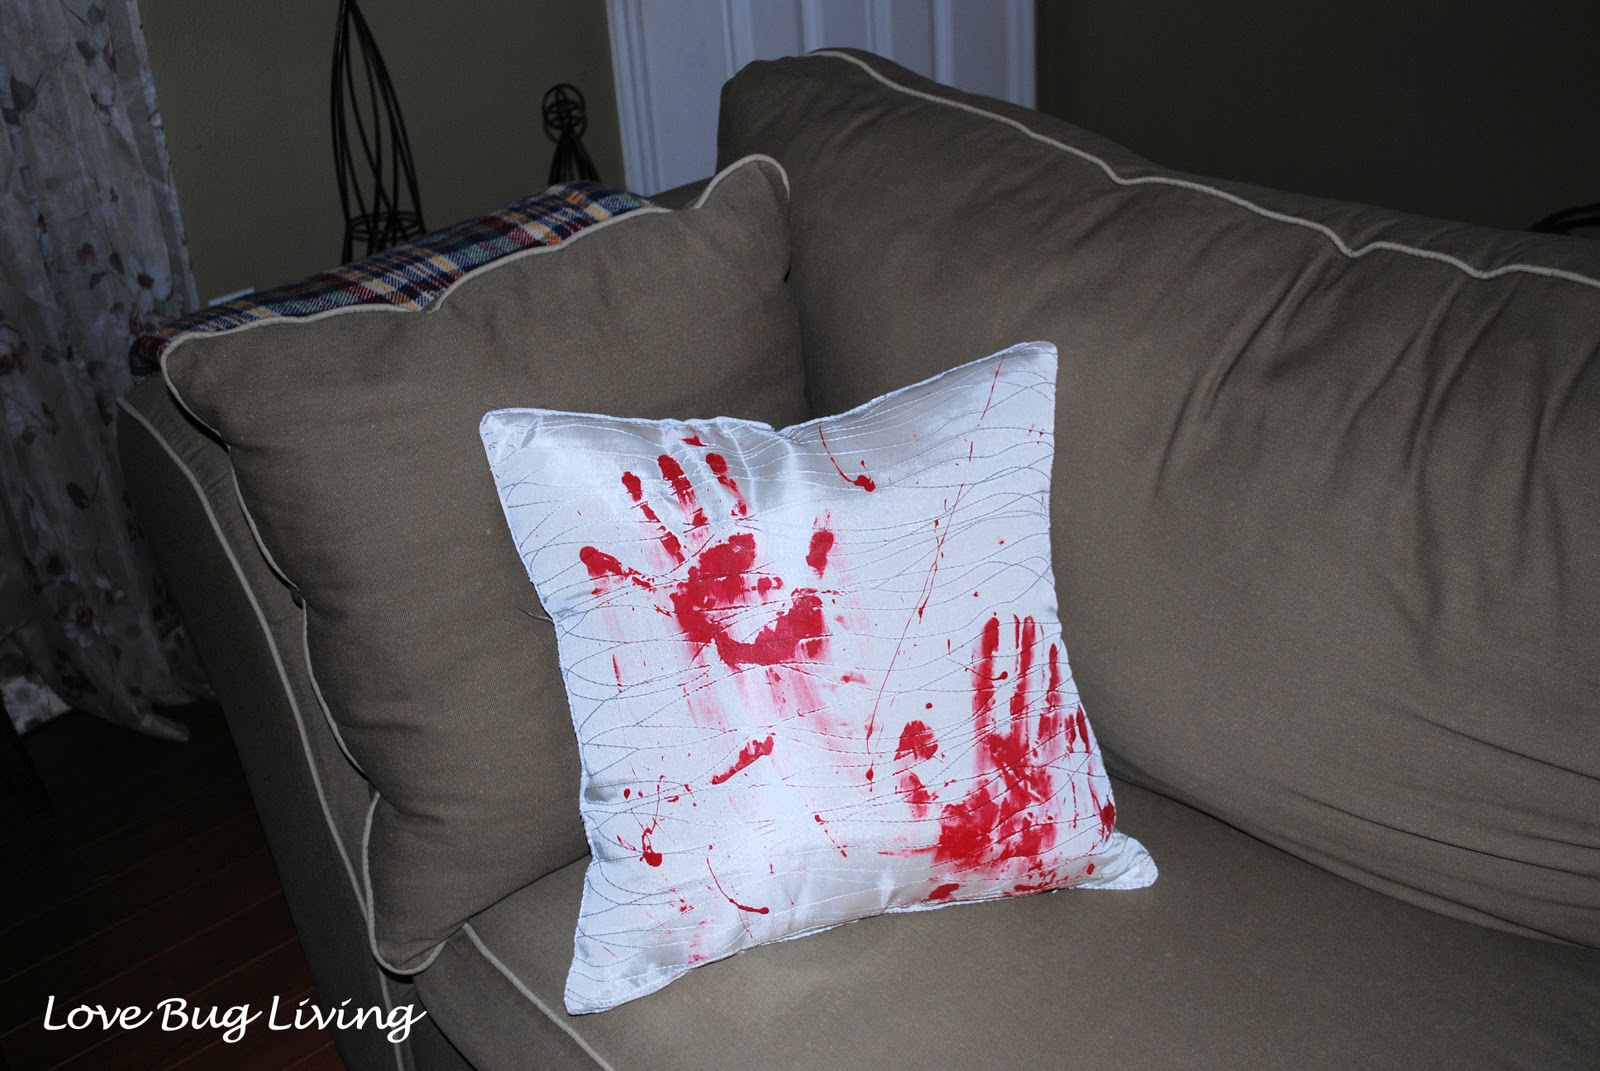 Love Bug Living Bloody Halloween Throw Pillow